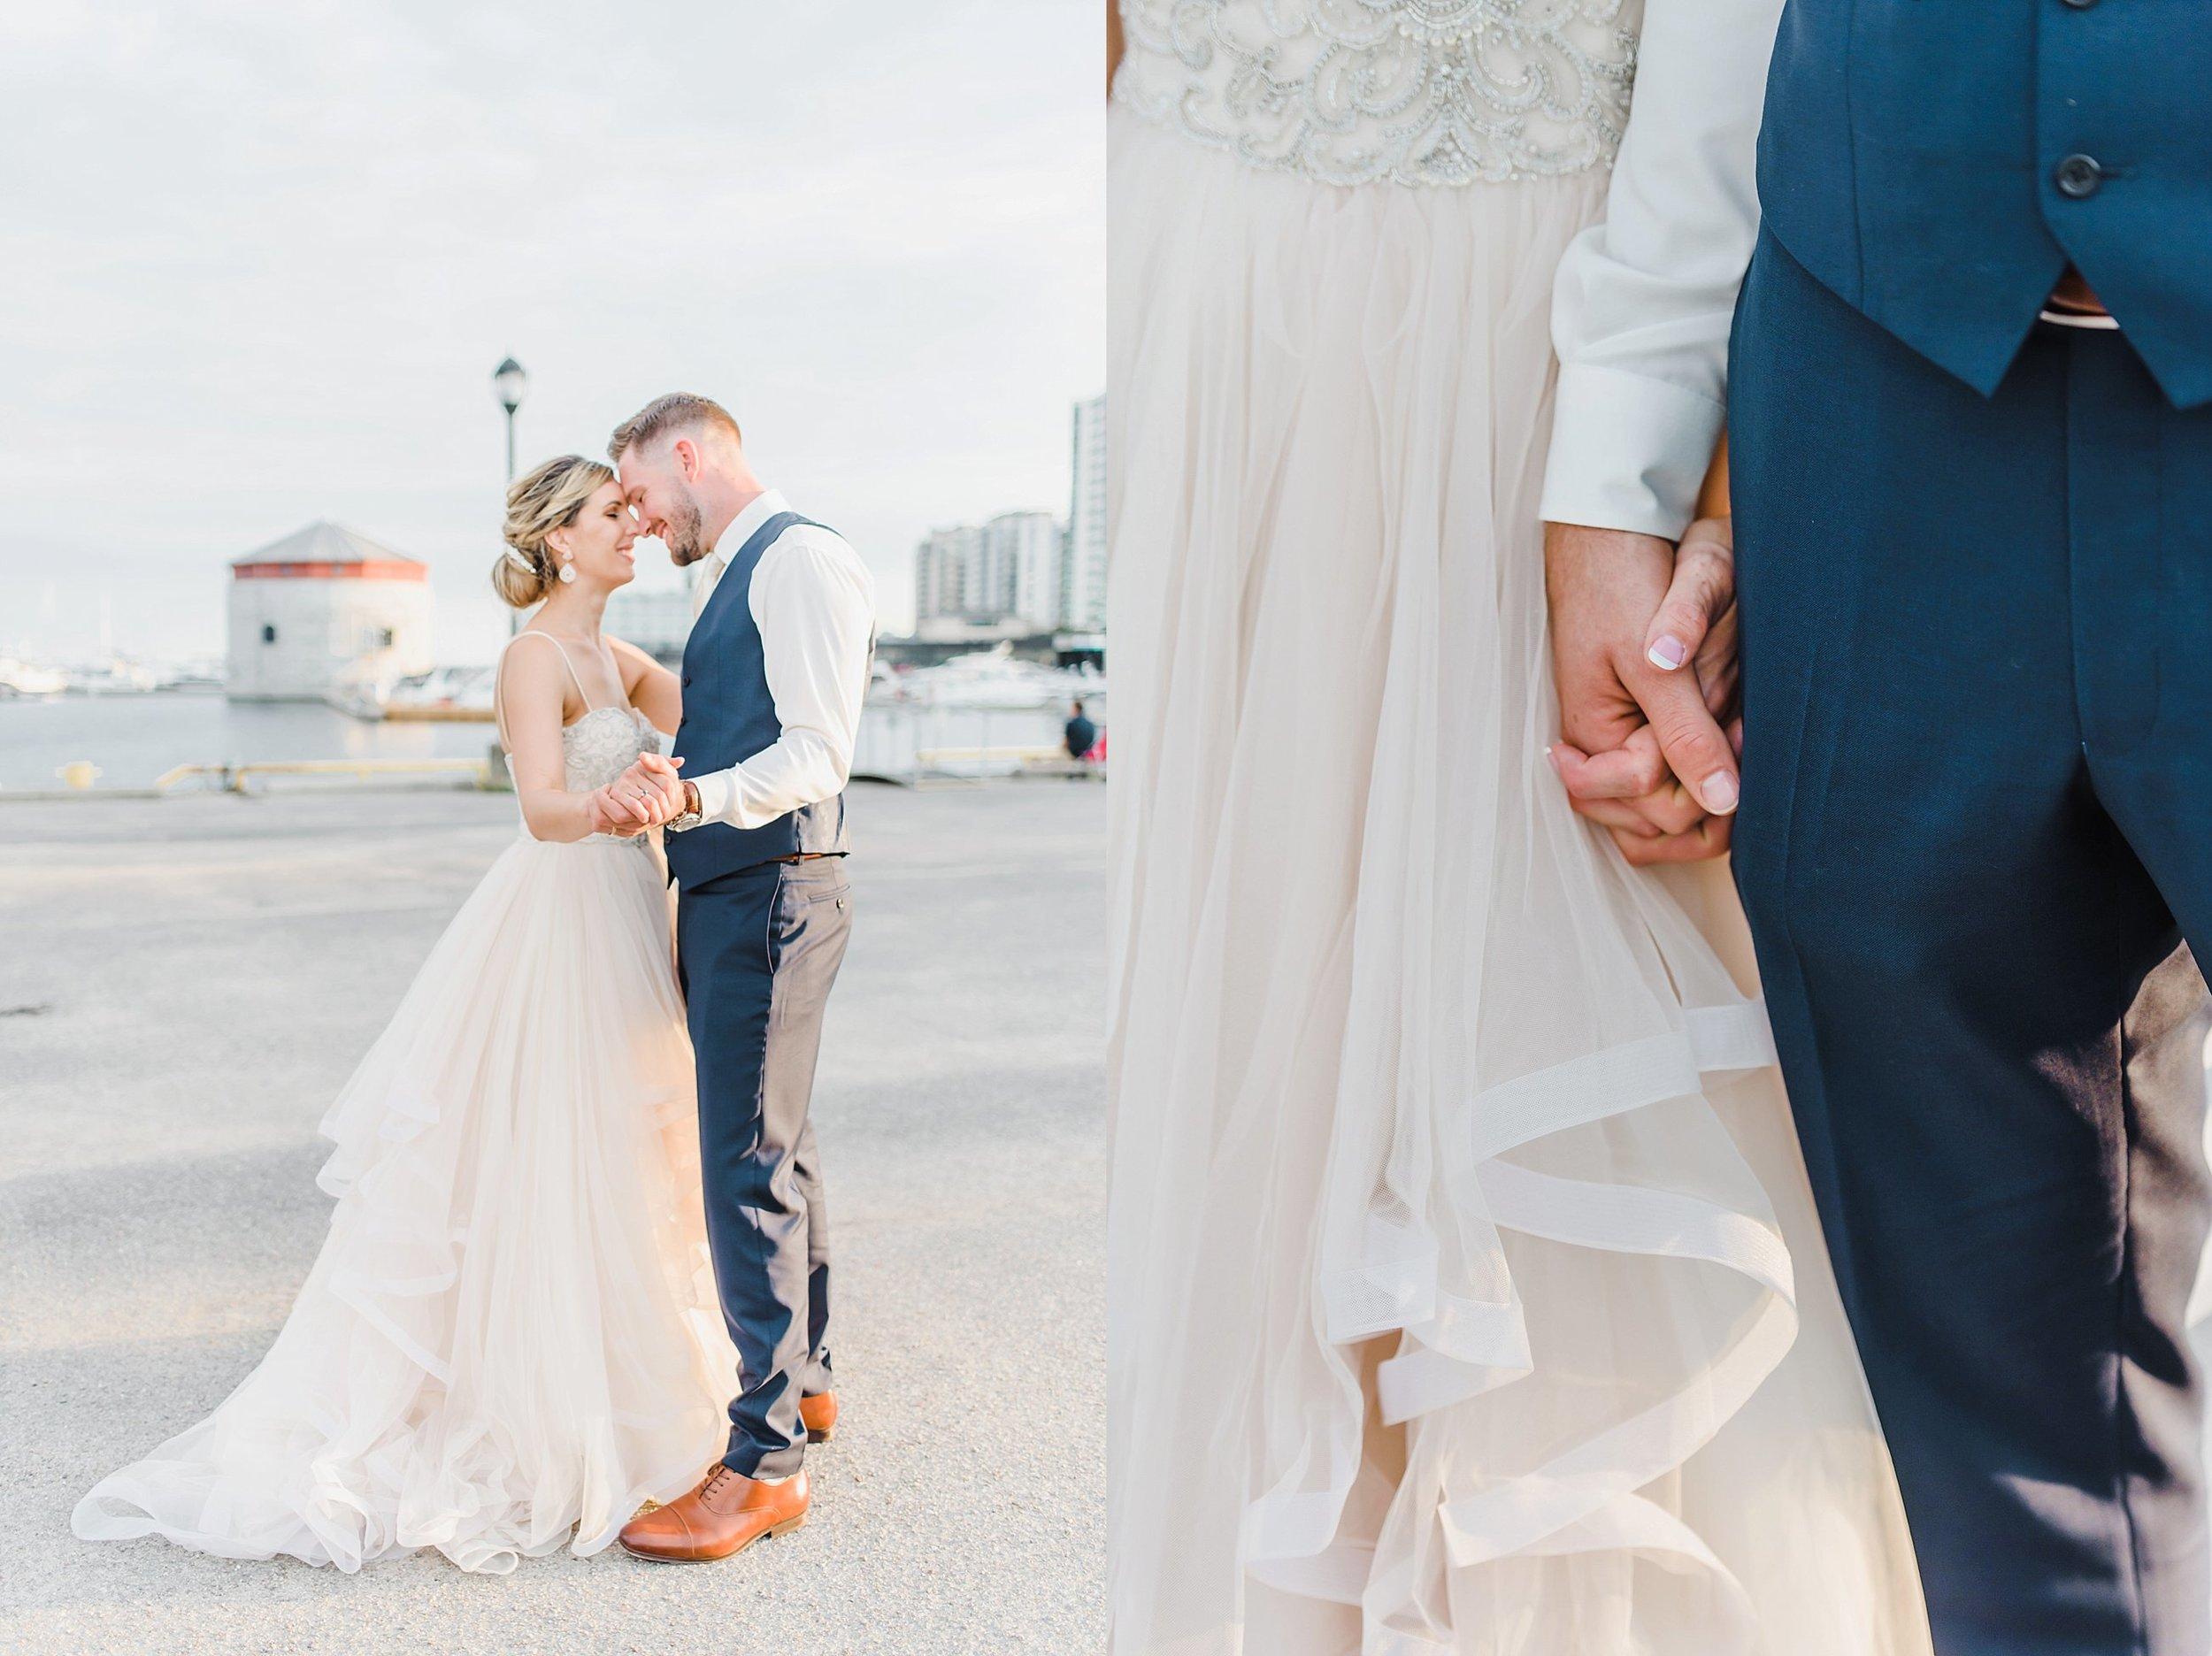 light airy indie fine art ottawa wedding photographer | Ali and Batoul Photography_0236.jpg